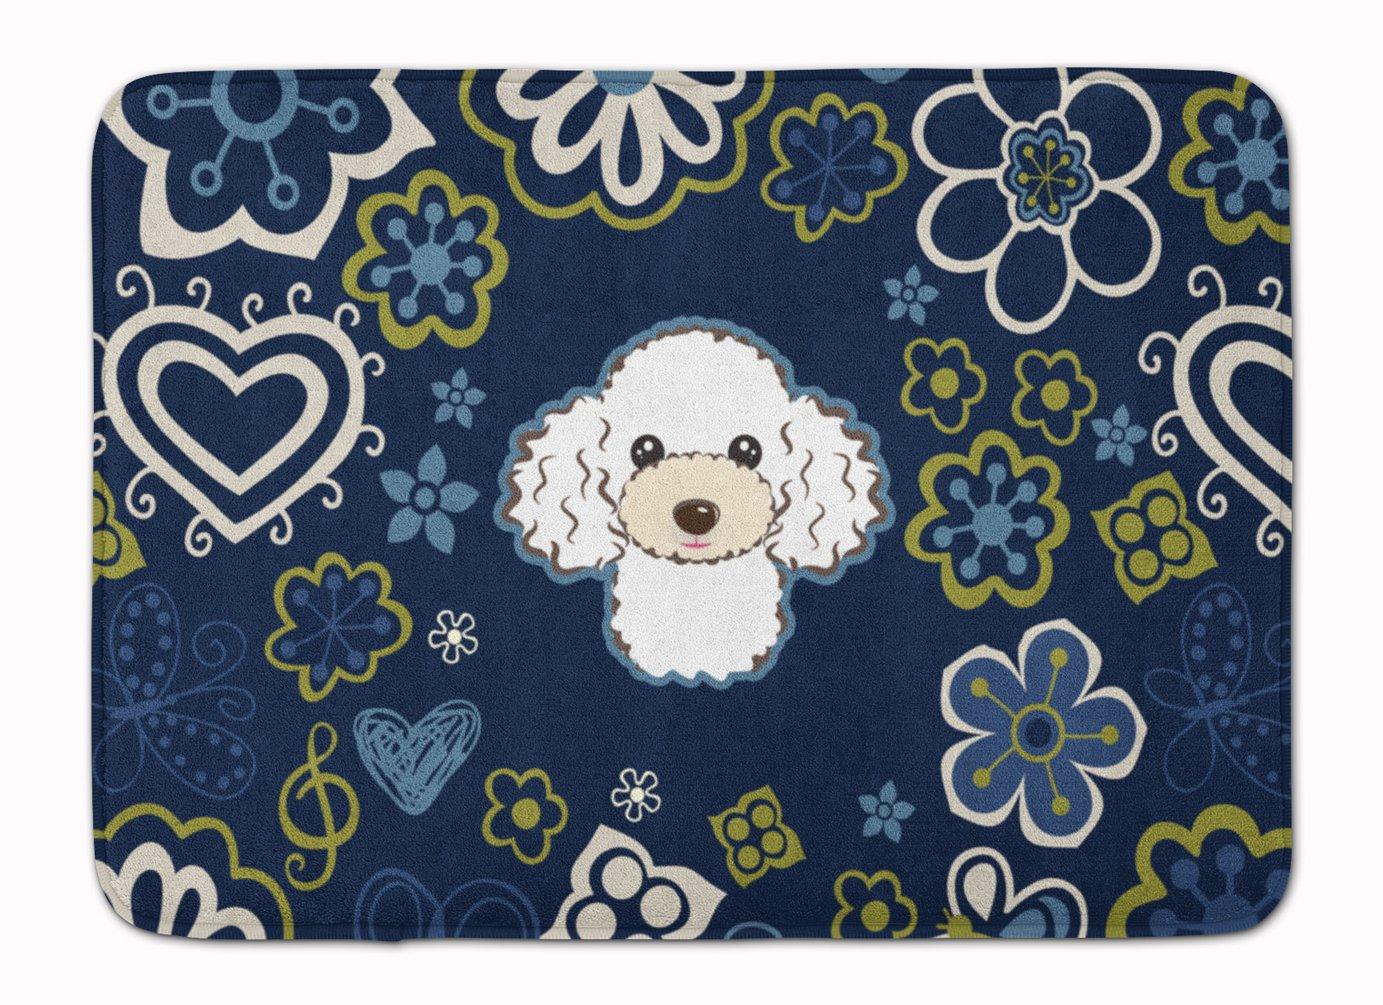 Caroline's Treasures Blue Flowers White Poodle Floor Mat 19' x 27' Multicolor